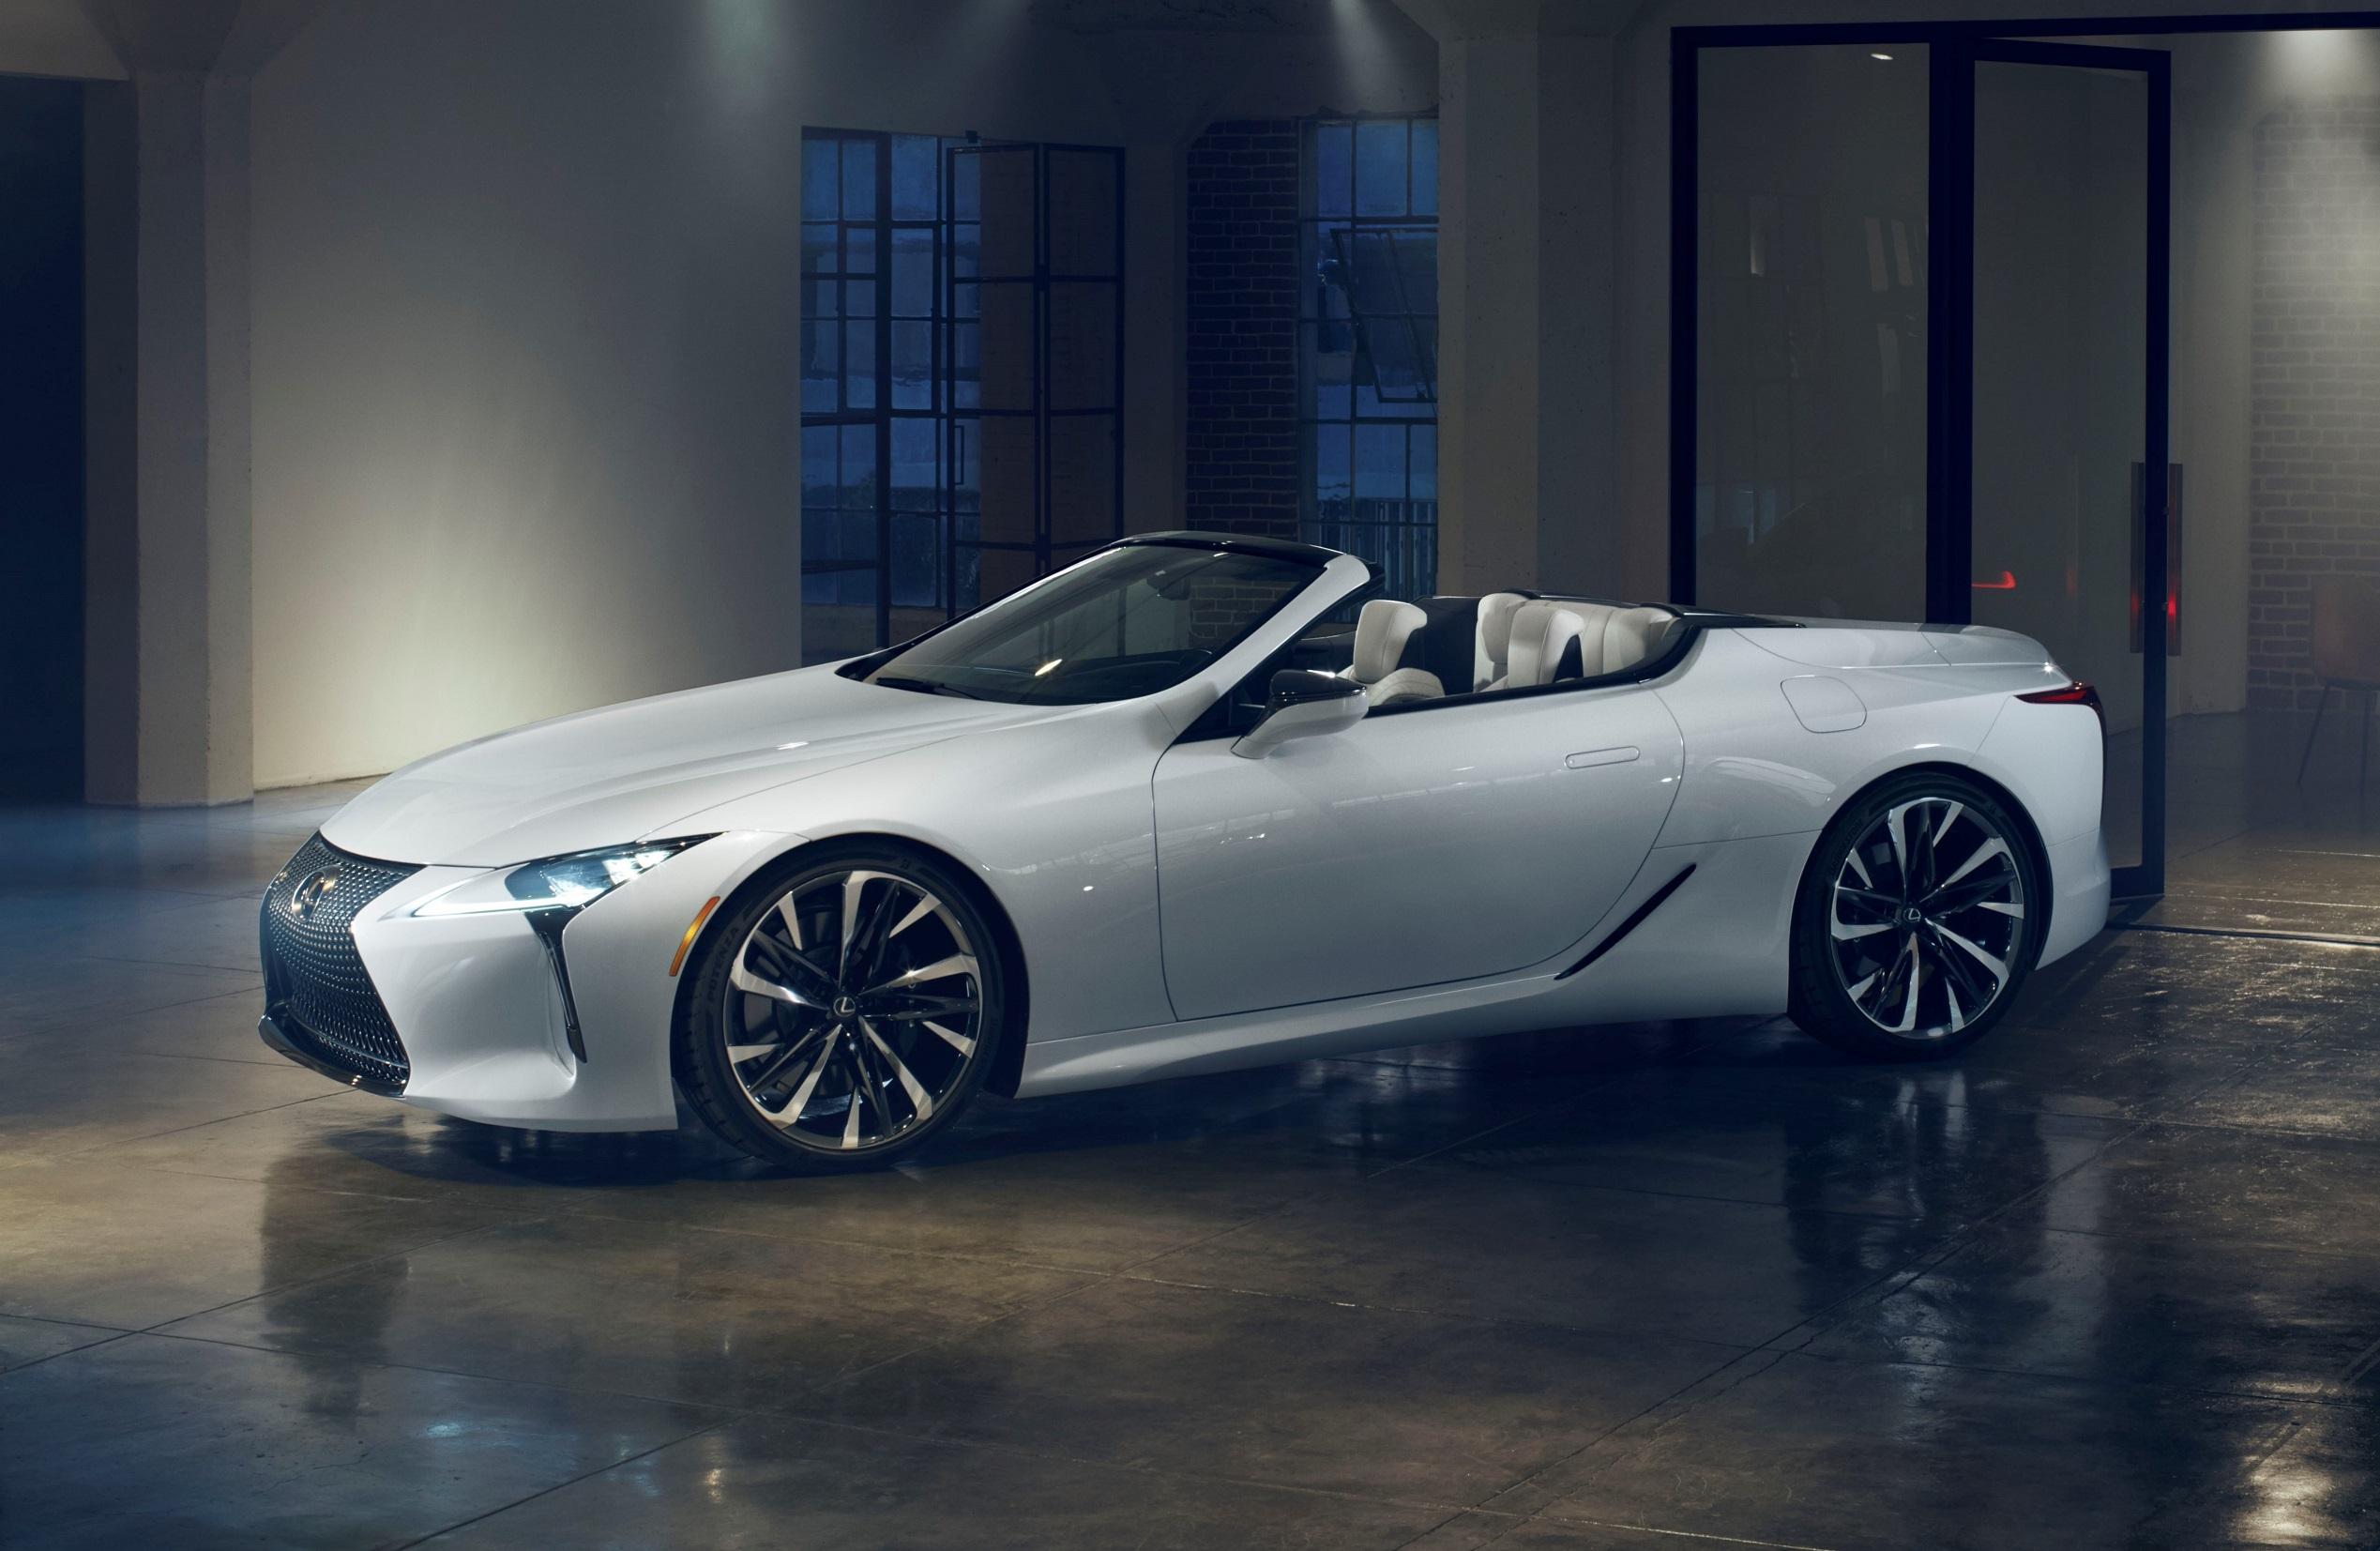 Lexus no salao de Genebra Informacao de imprensa